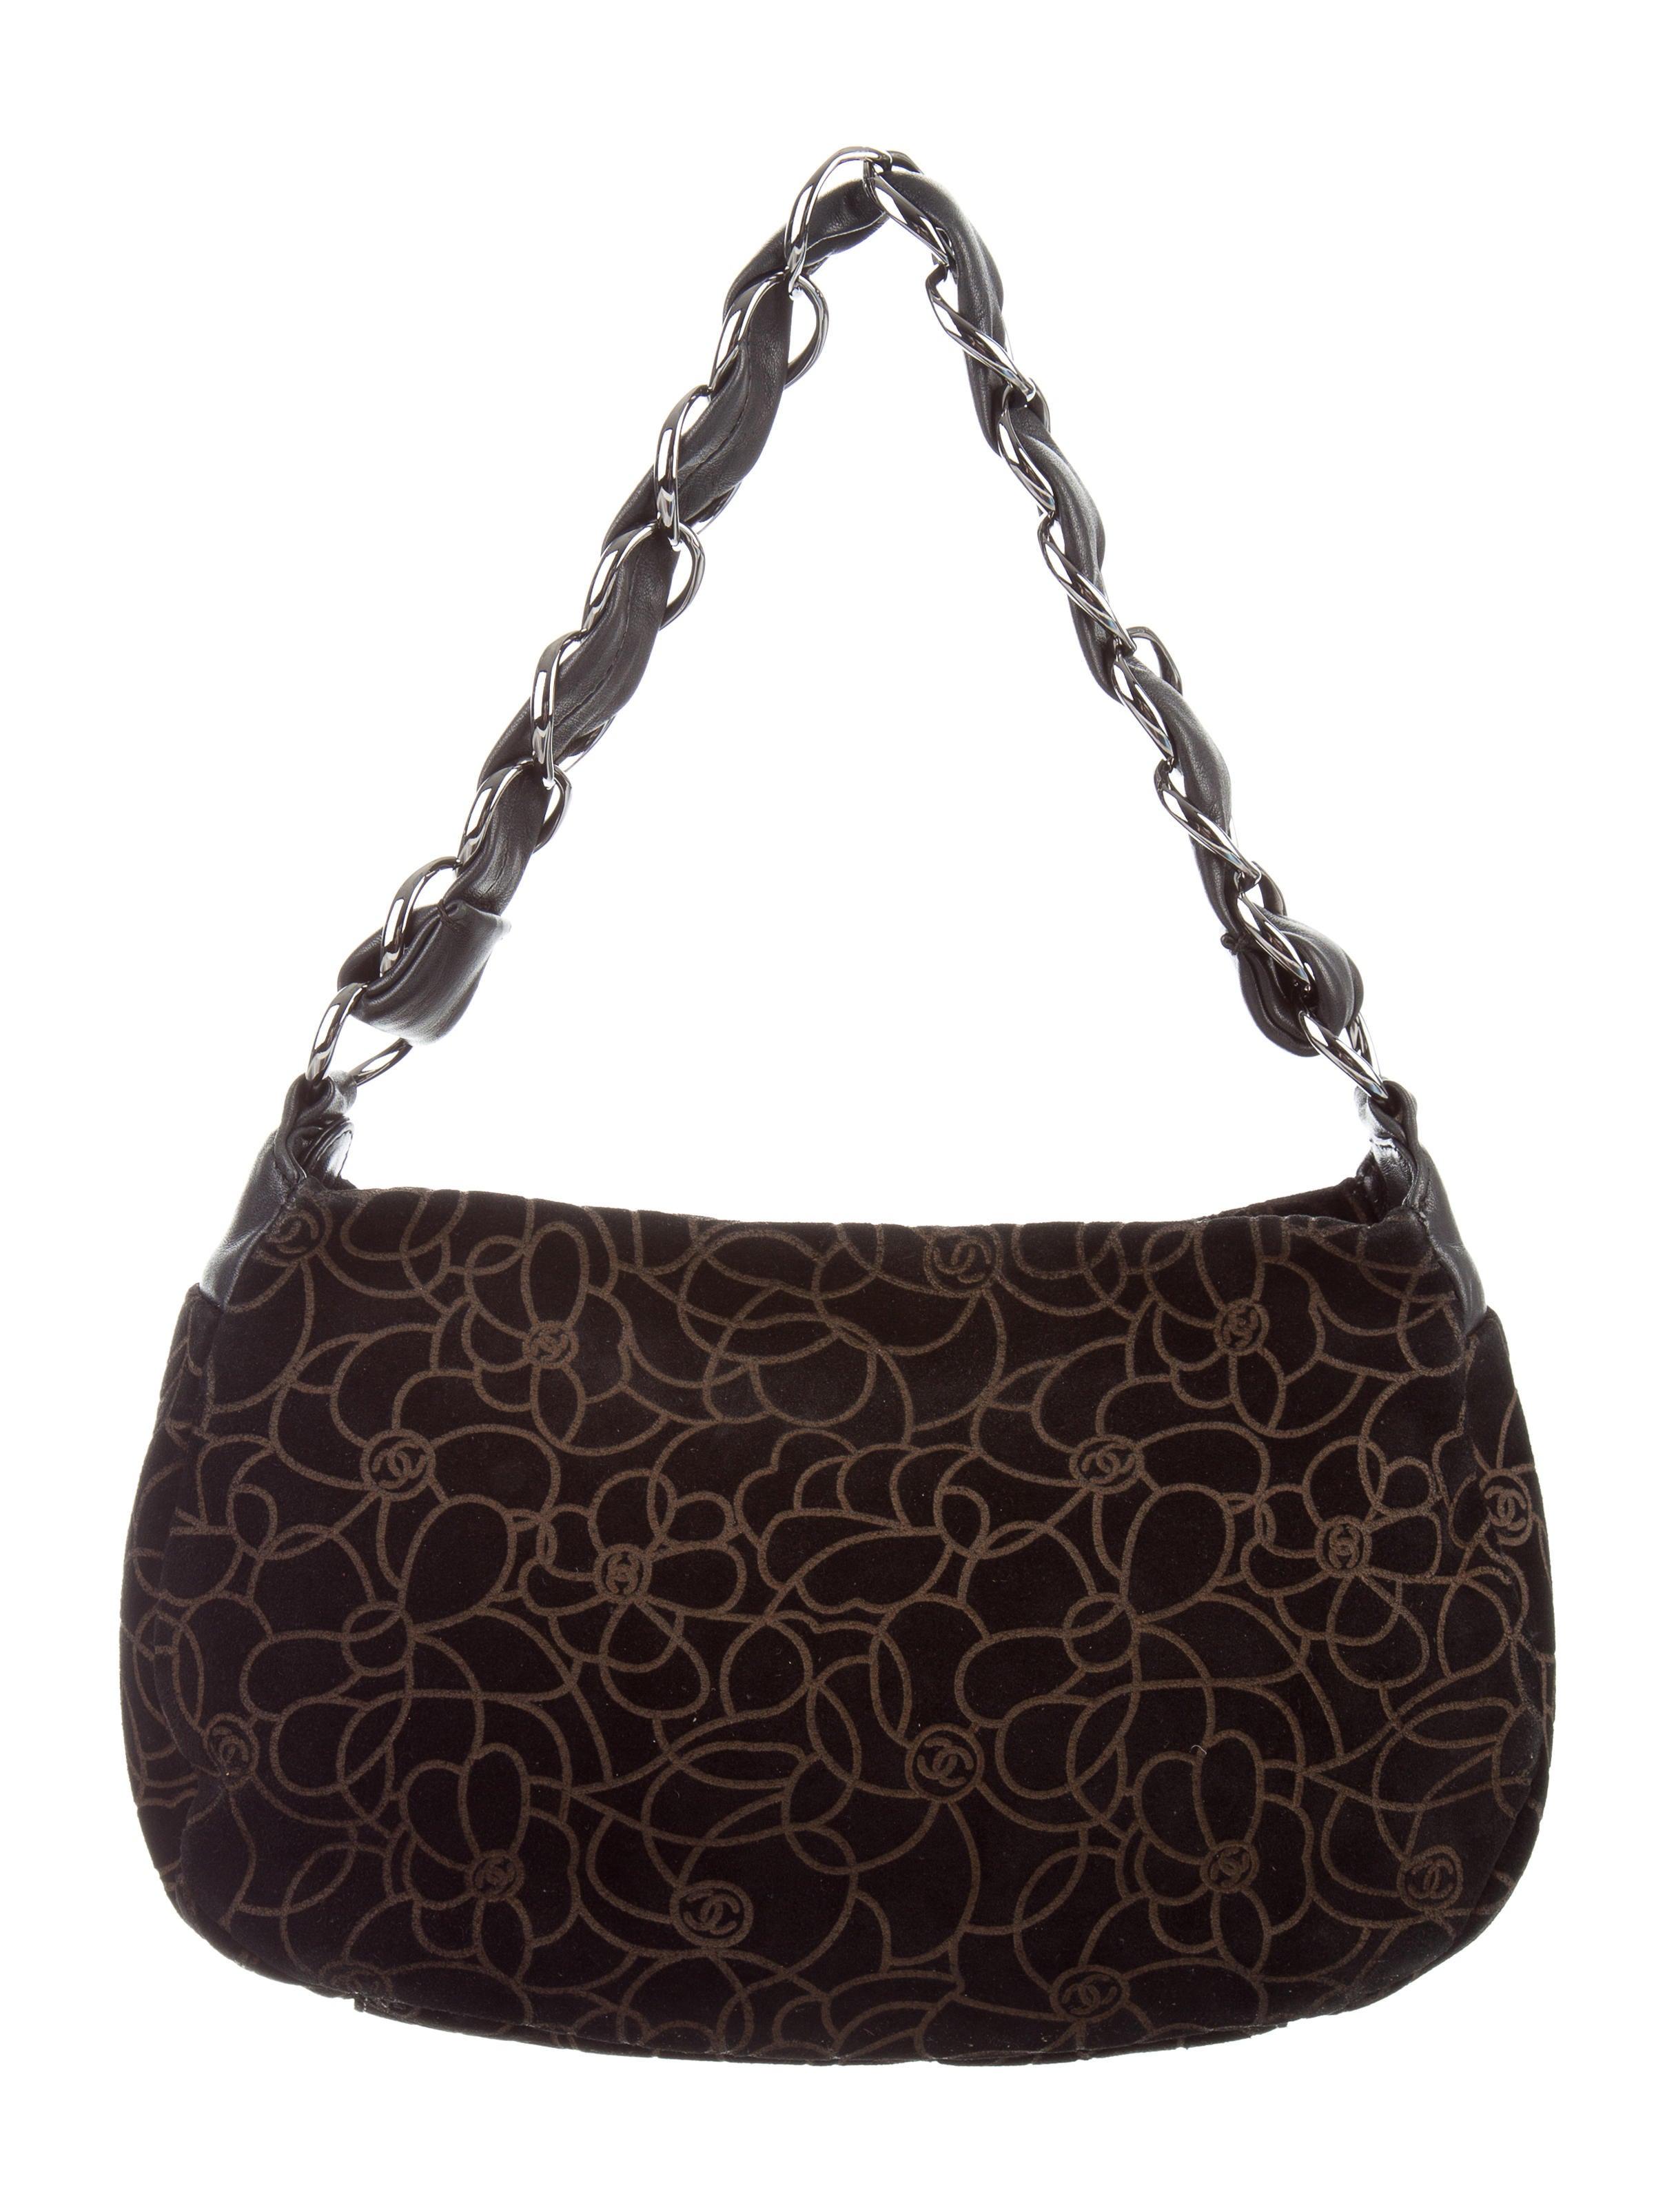 chanel camellia shoulder bag handbags cha187336 the